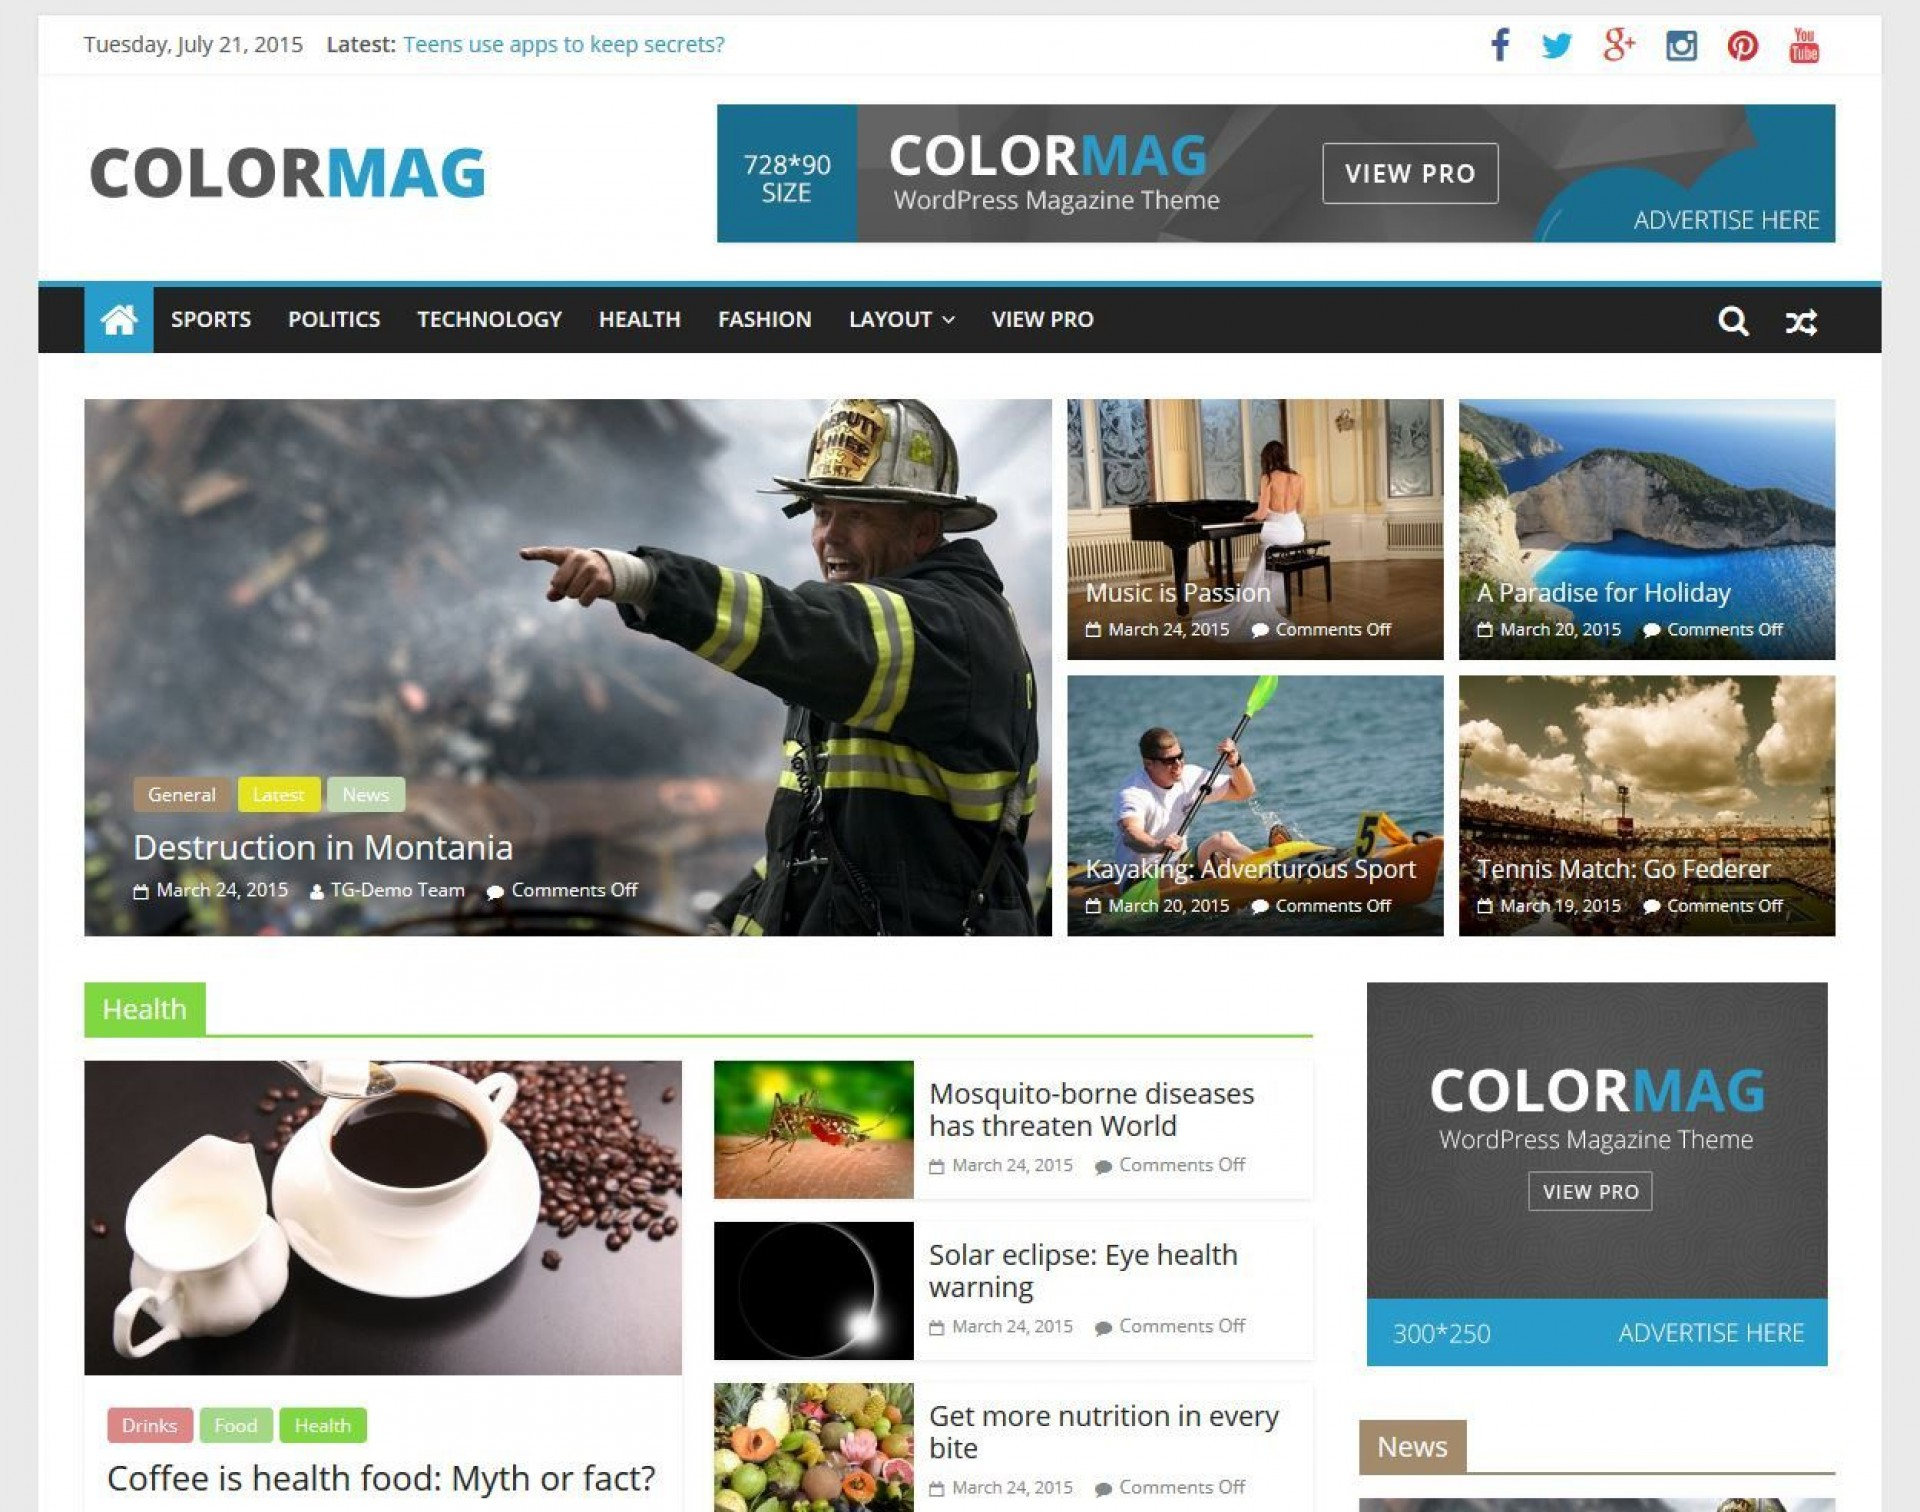 002 Breathtaking One Page Website Template Free Download Wordpres Design  Wordpress1920